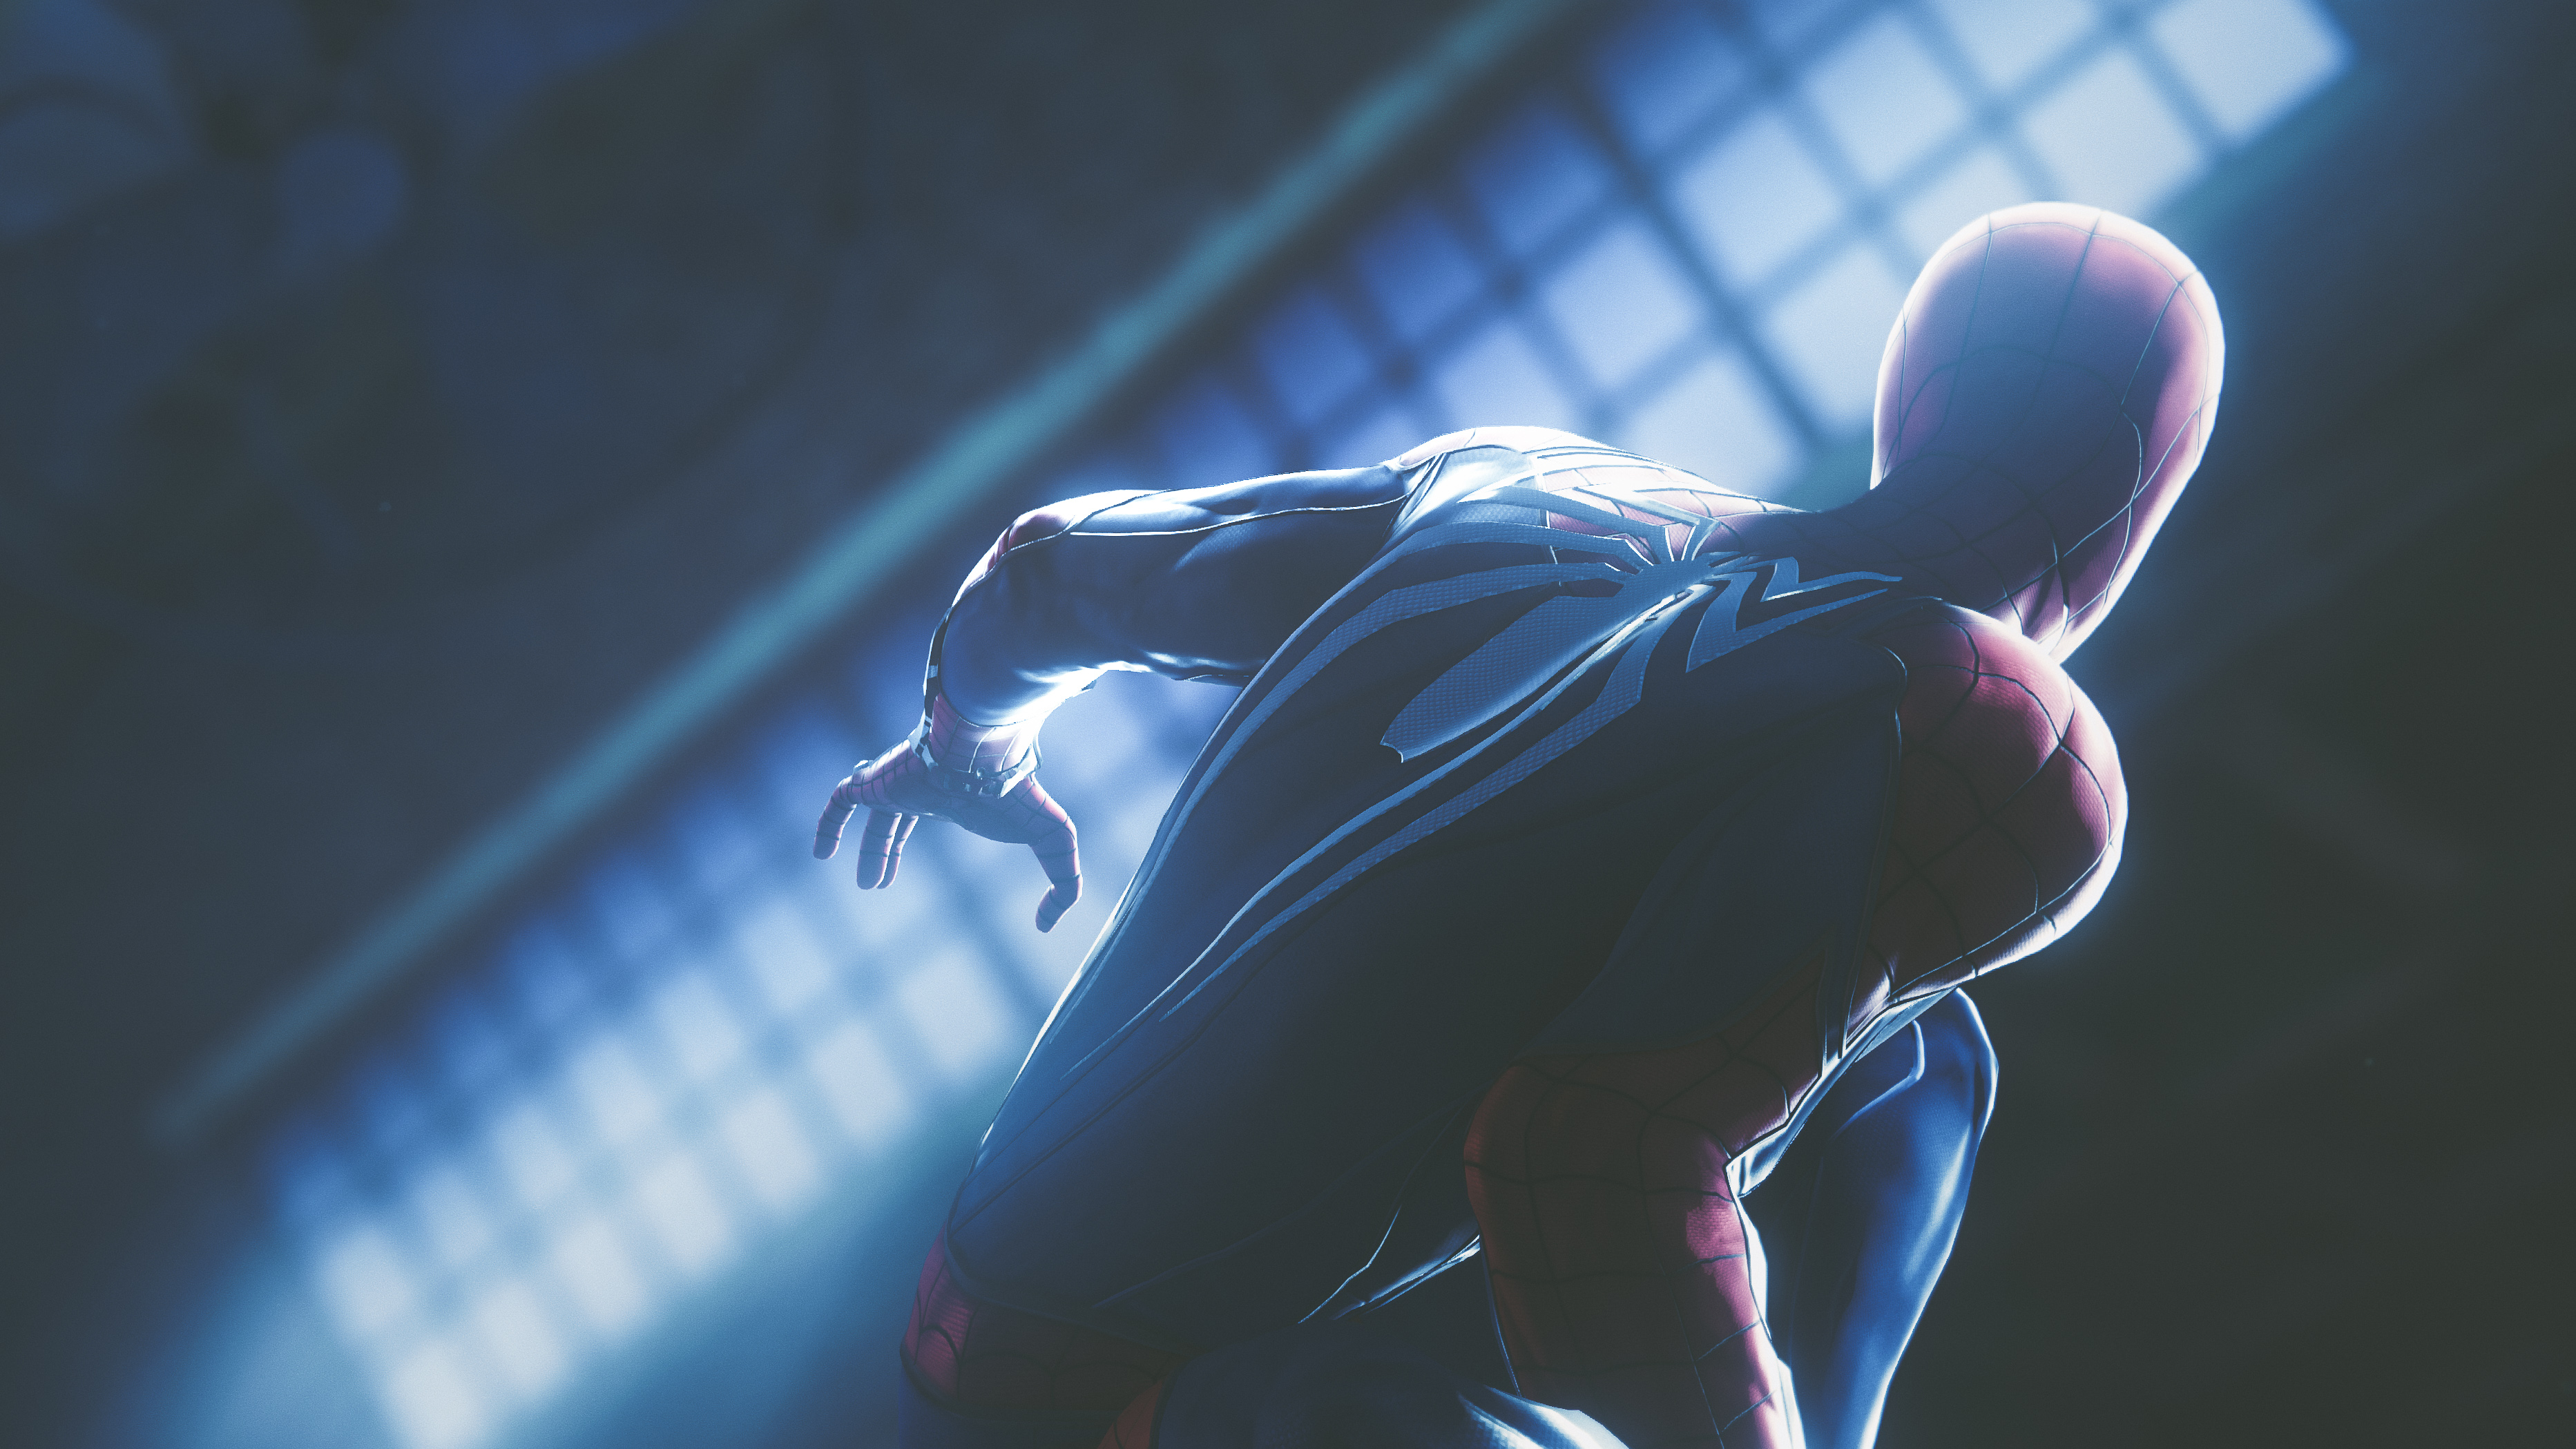 Marvel Spiderman 4k, HD Games, 4k Wallpapers, Images ...